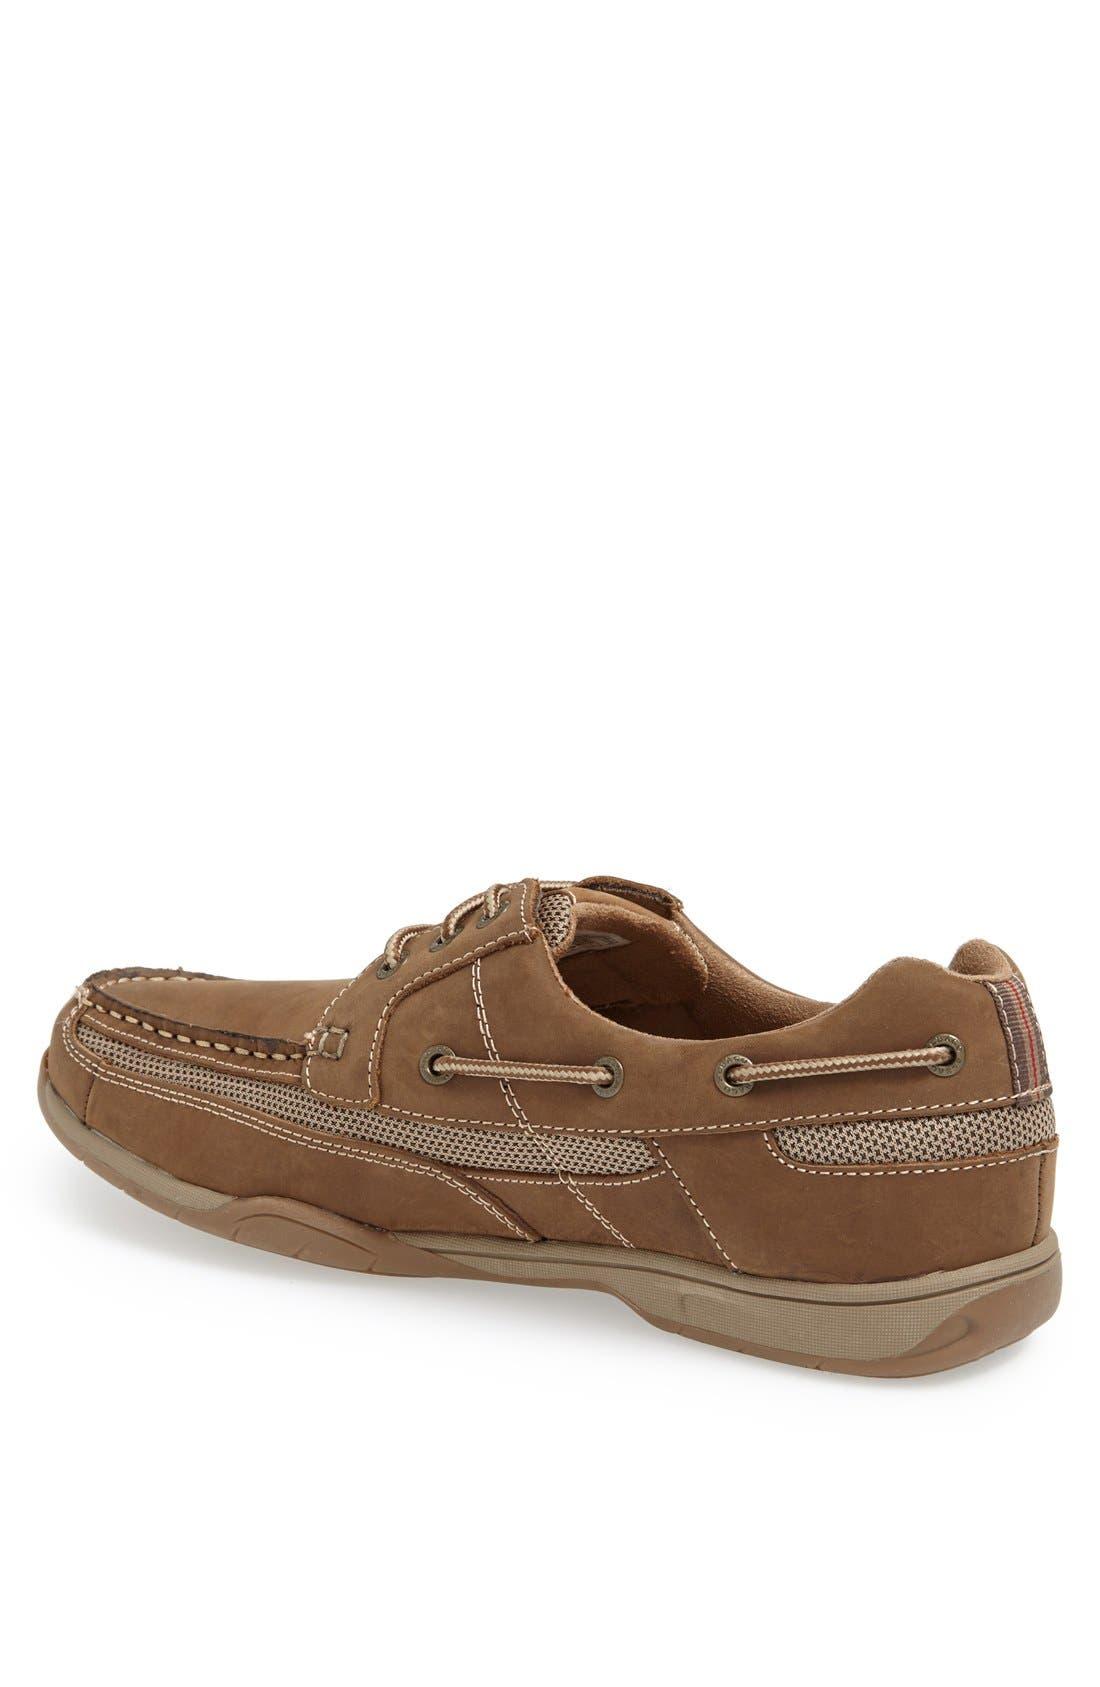 Alternate Image 2  - Sebago 'Carrick' Boat Shoe